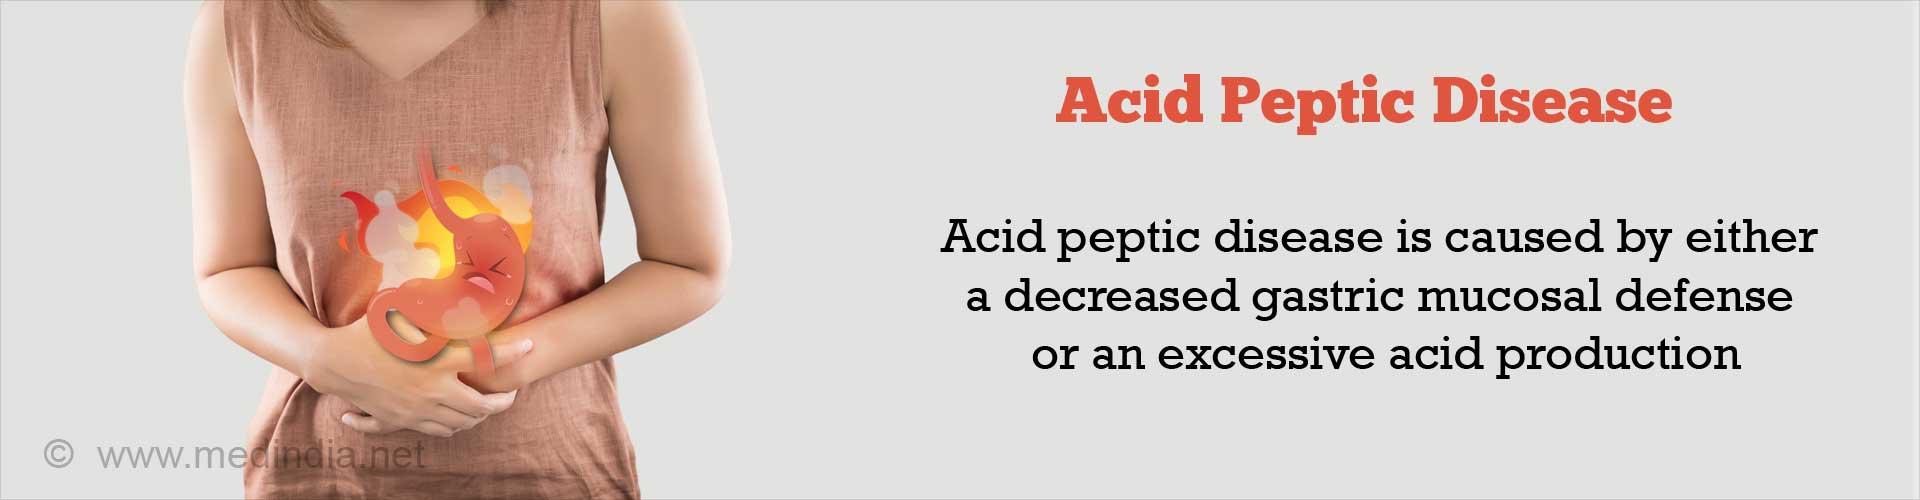 Acid Peptic Disease